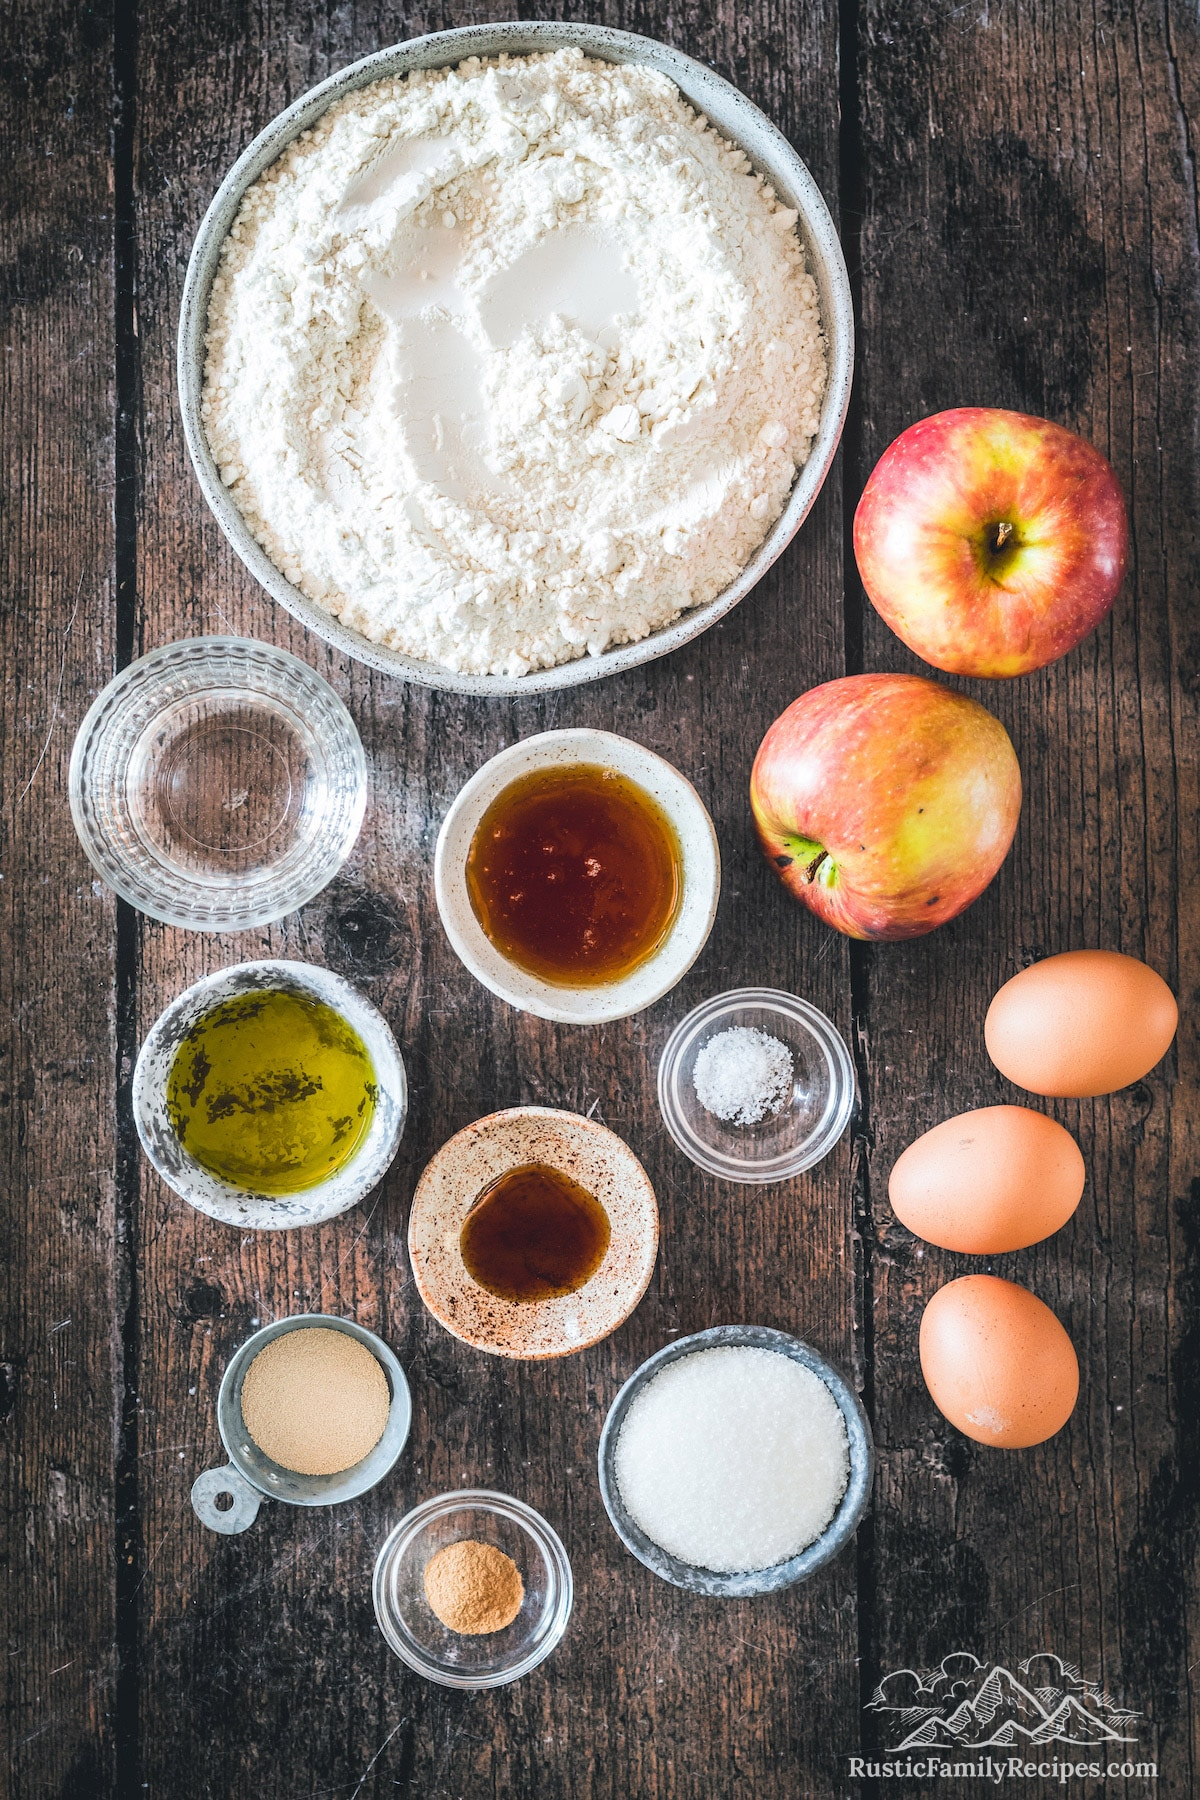 Overhead shot of Apple Harvest Bread ingredients